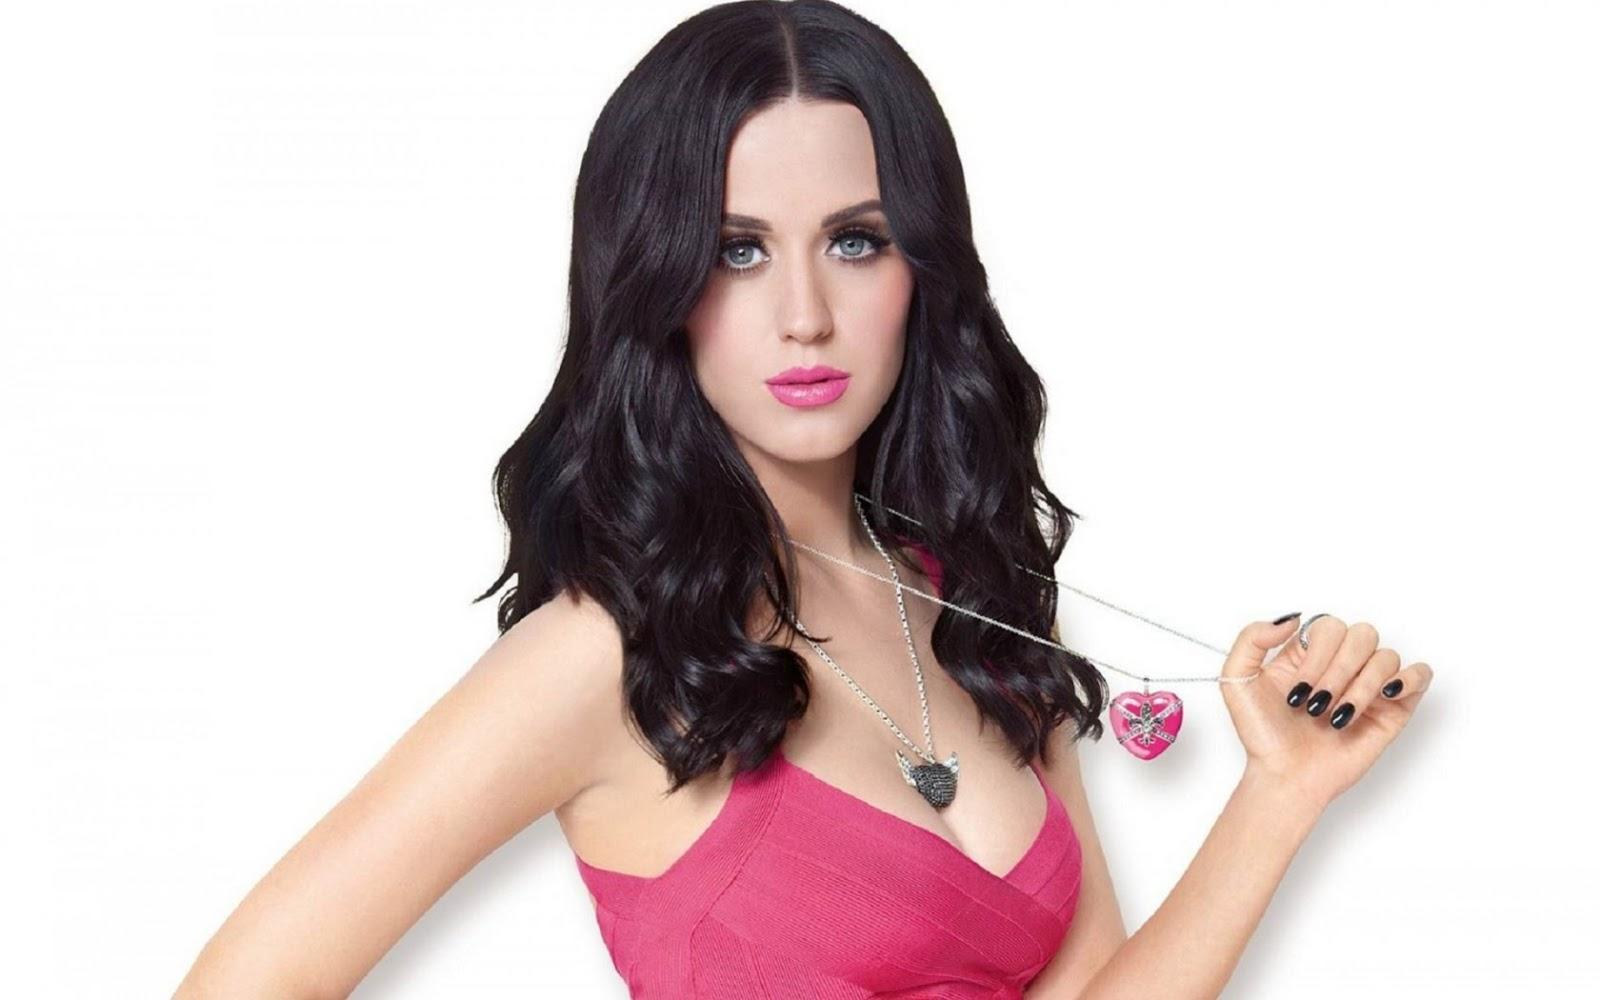 Katy Perry Hd Wallpapers: Katy Perry Hollywood Hot Actress Fresh Hd Wallpaper 2013